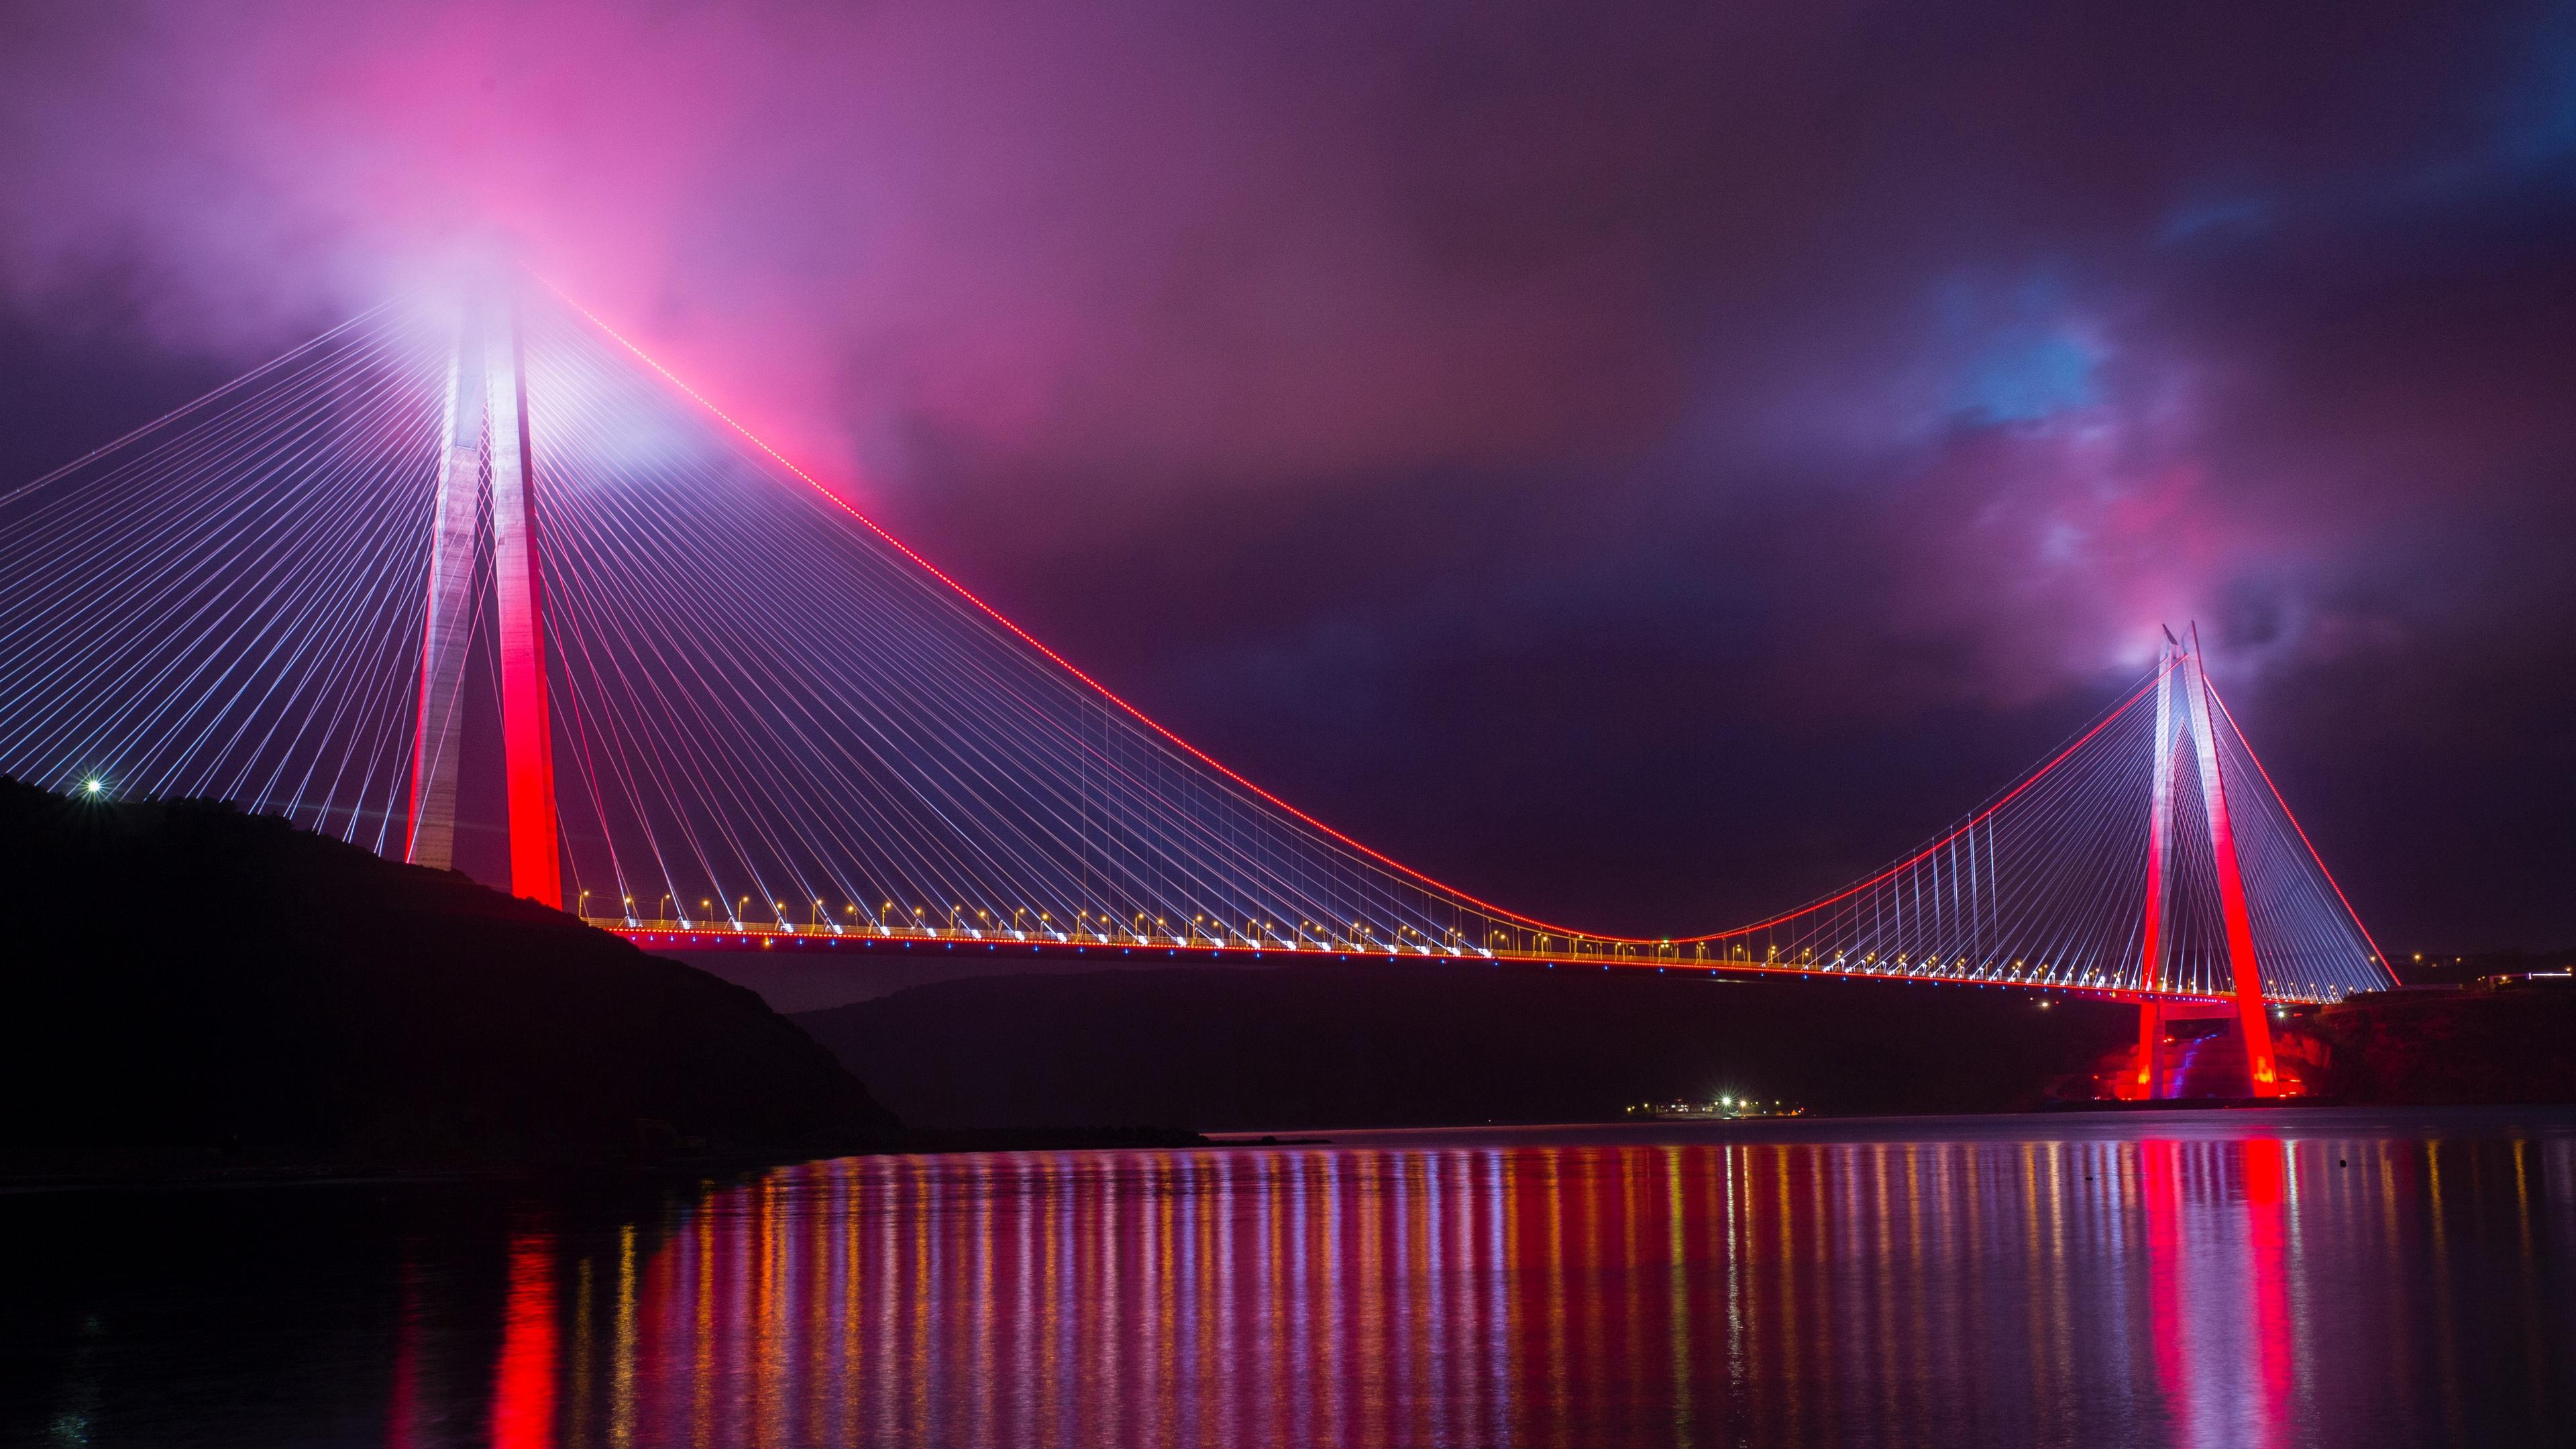 bridge night city lighting design turkey 4k 1538068763 - bridge, night city, lighting, design, turkey 4k - night city, Lighting, bridge